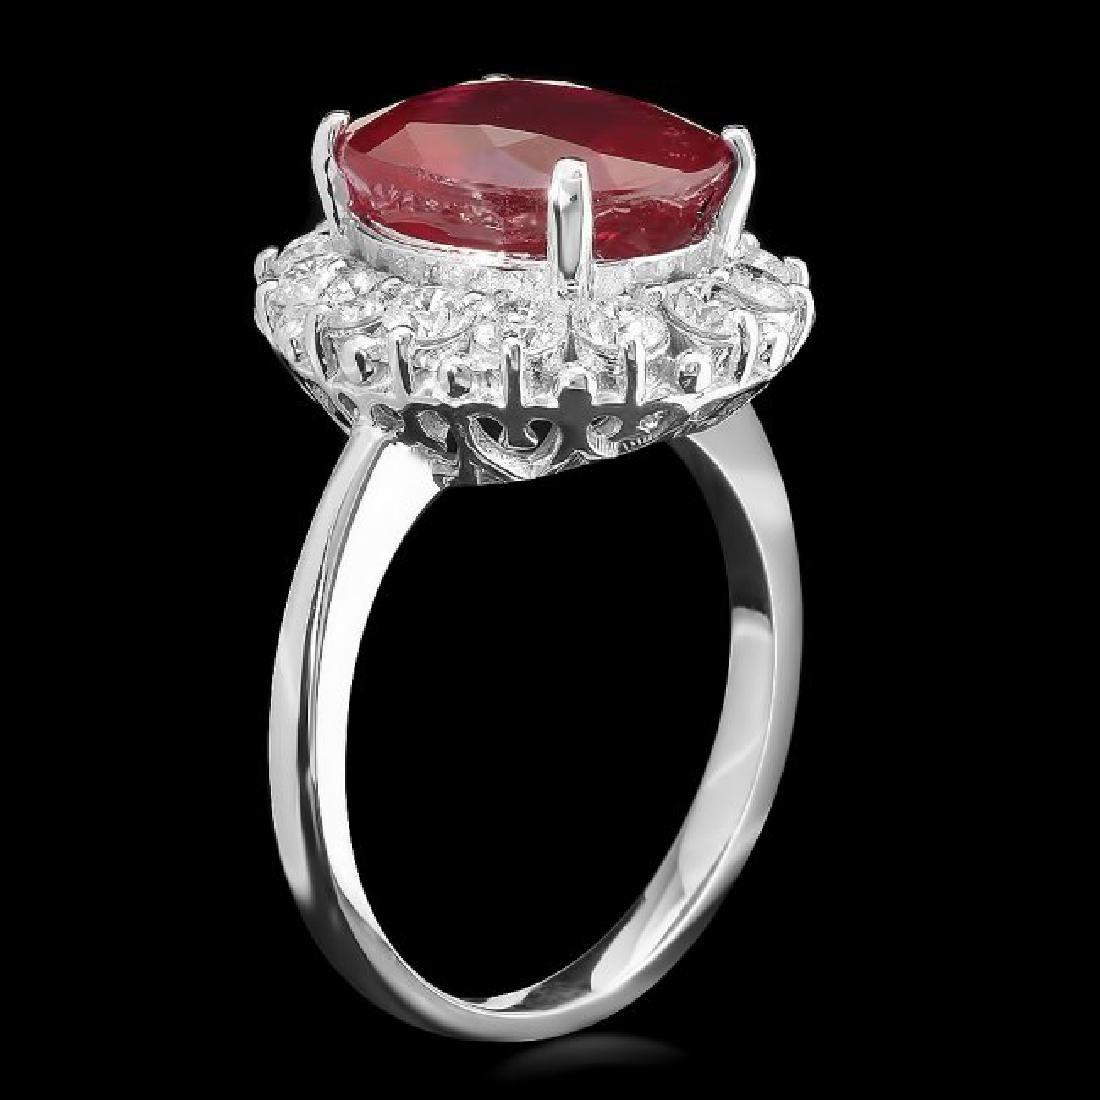 14k White Gold 6.40ct Ruby 1ct Diamond Ring - 2